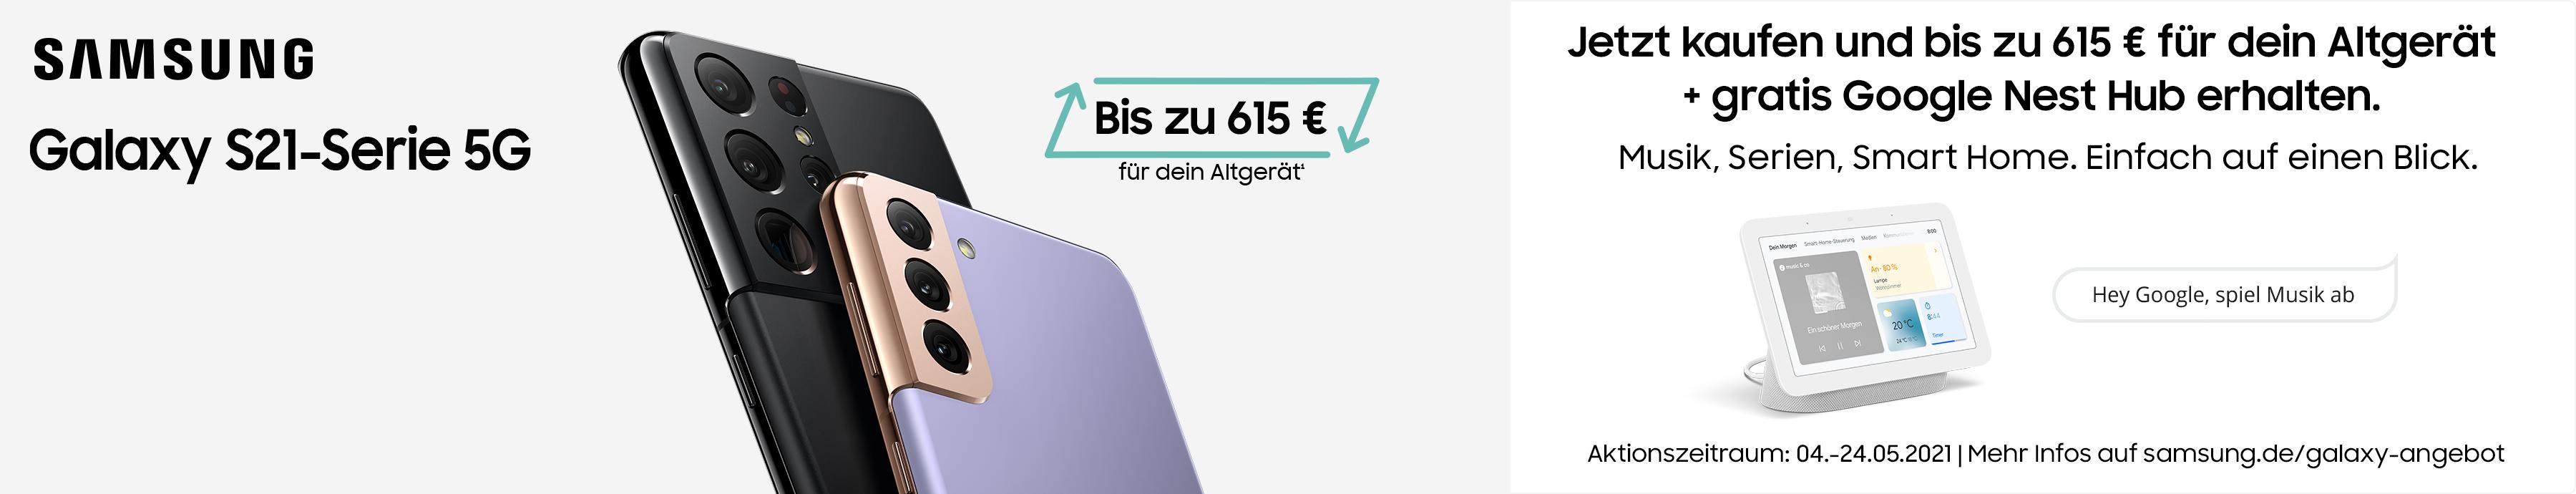 Samsung Galaxy S21 5G, S21+ 5G, S21 Ultra 5G